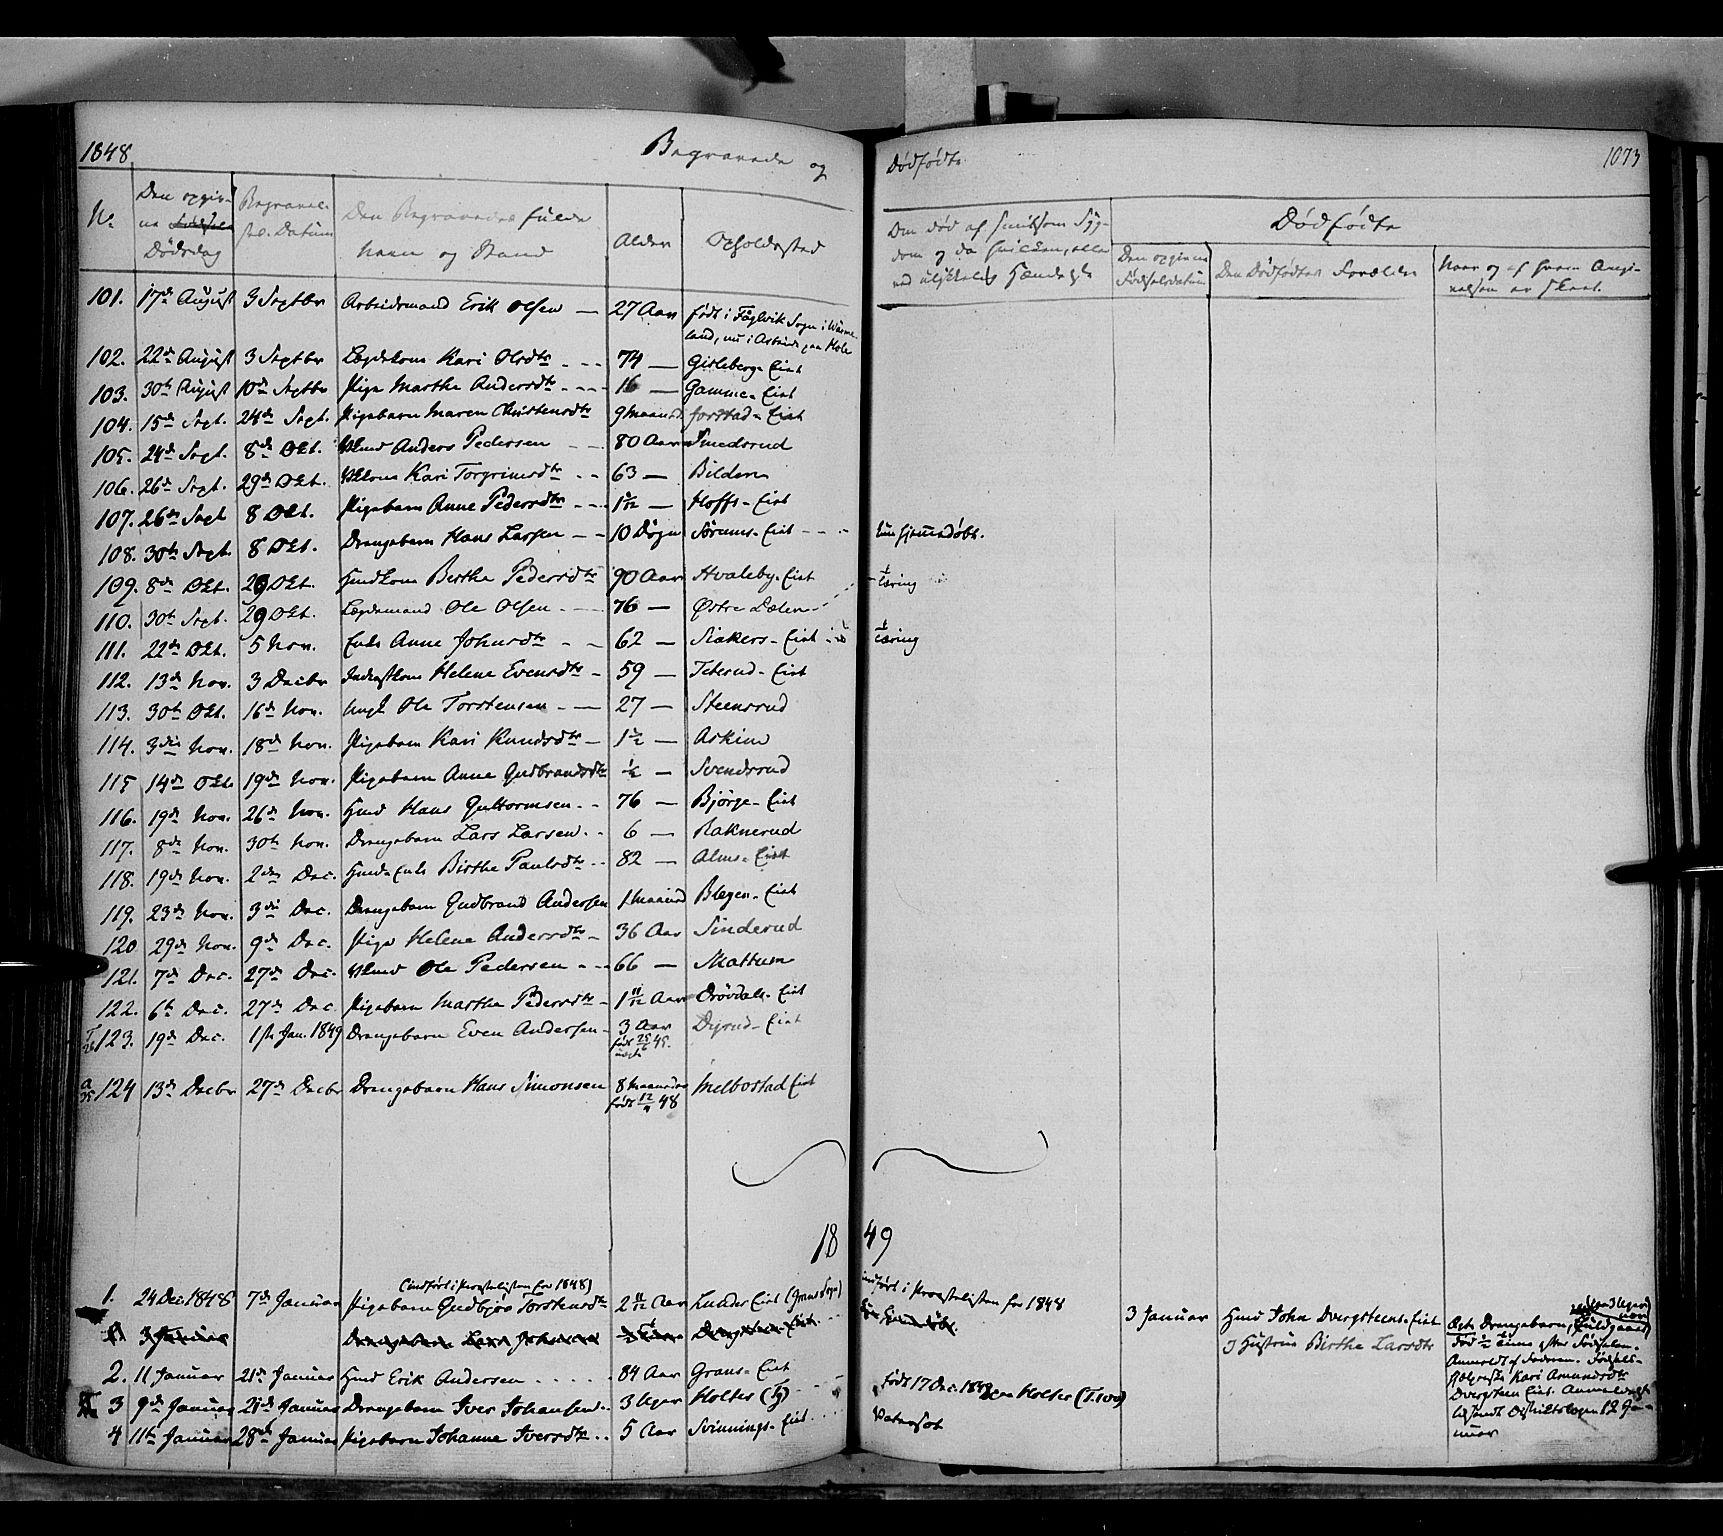 SAH, Gran prestekontor, Ministerialbok nr. 11, 1842-1856, s. 1072-1073